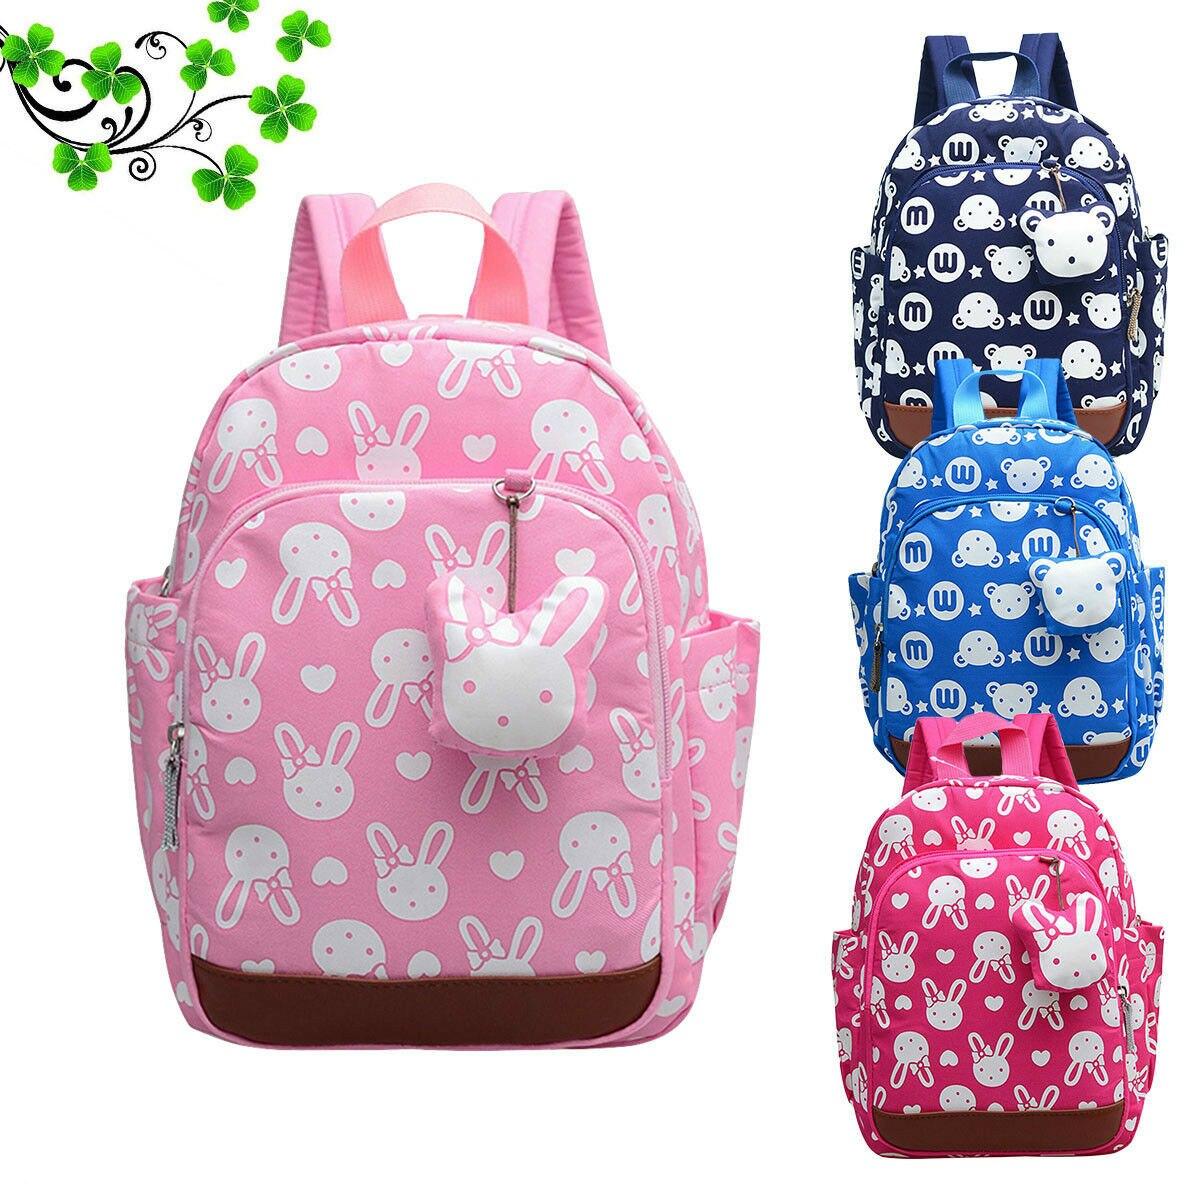 Baby Cartoon School Bag Toddler Kid Boy Girl Cute Rabbit Backpack Kindergarten Mini Backpack